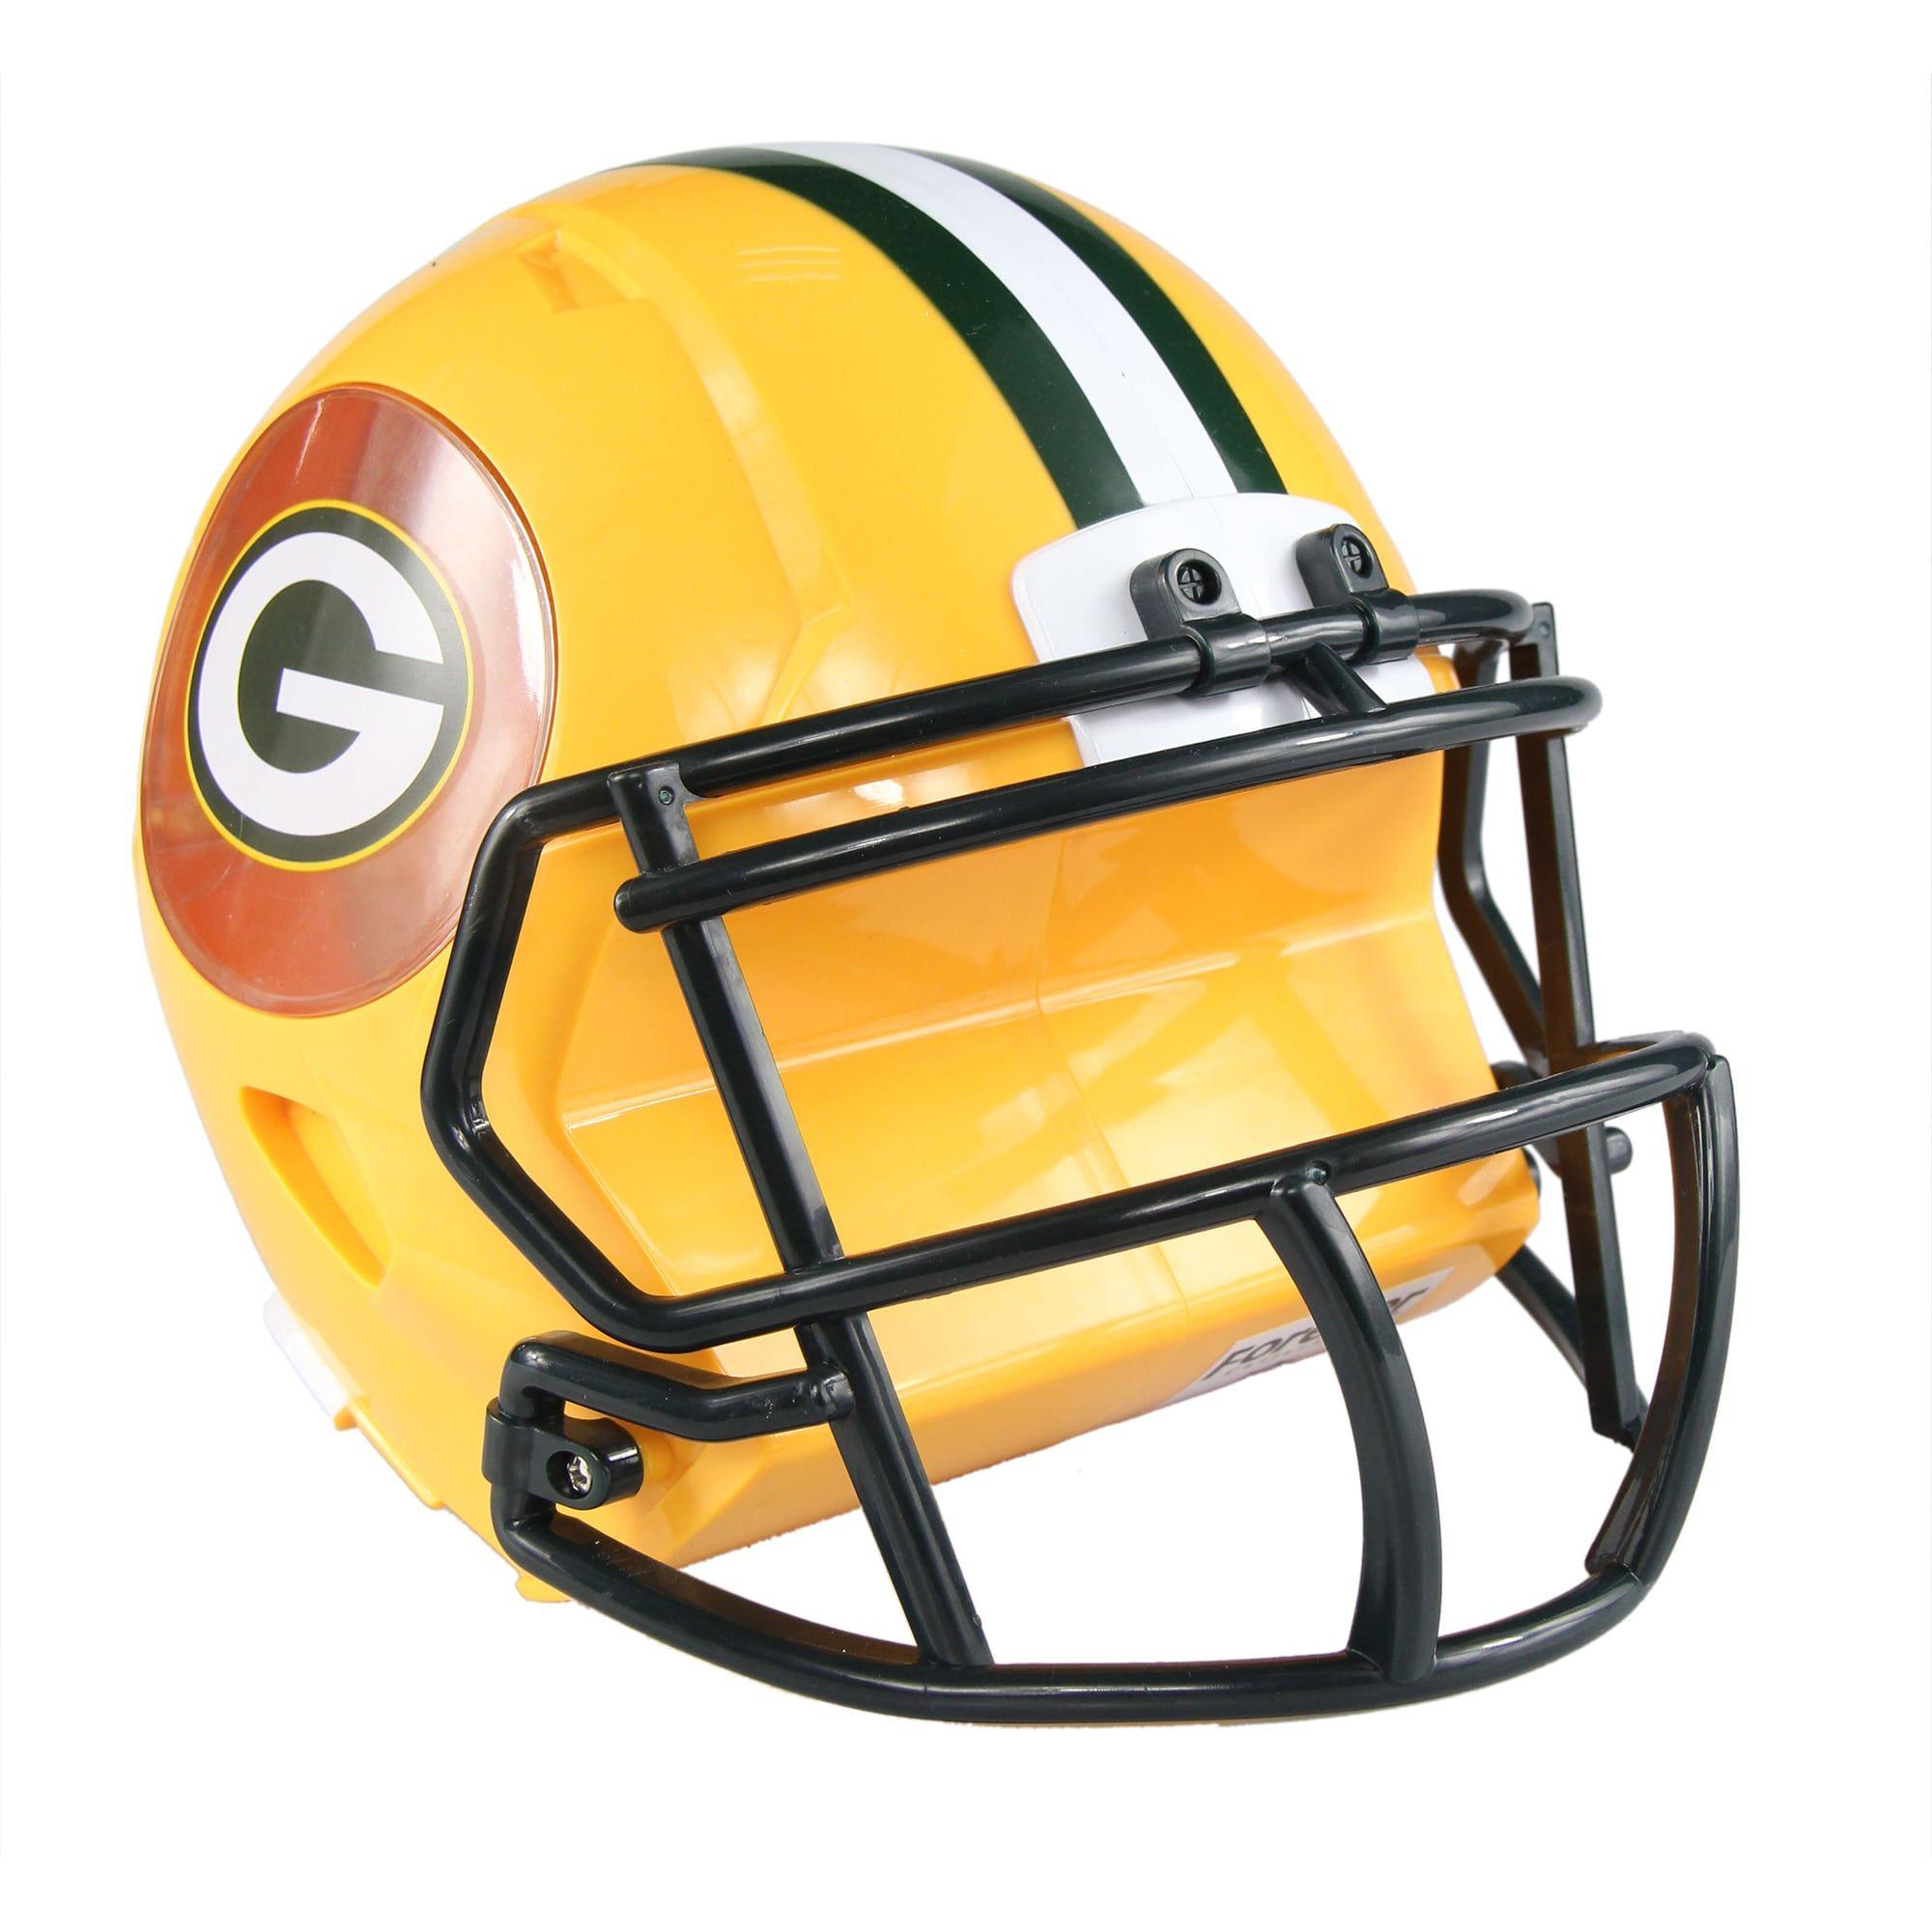 Green Bay Packers Nfl Mini Helmet Bank 1 Green Bay Packers Helmet Nfl Green Bay Nfl Packers